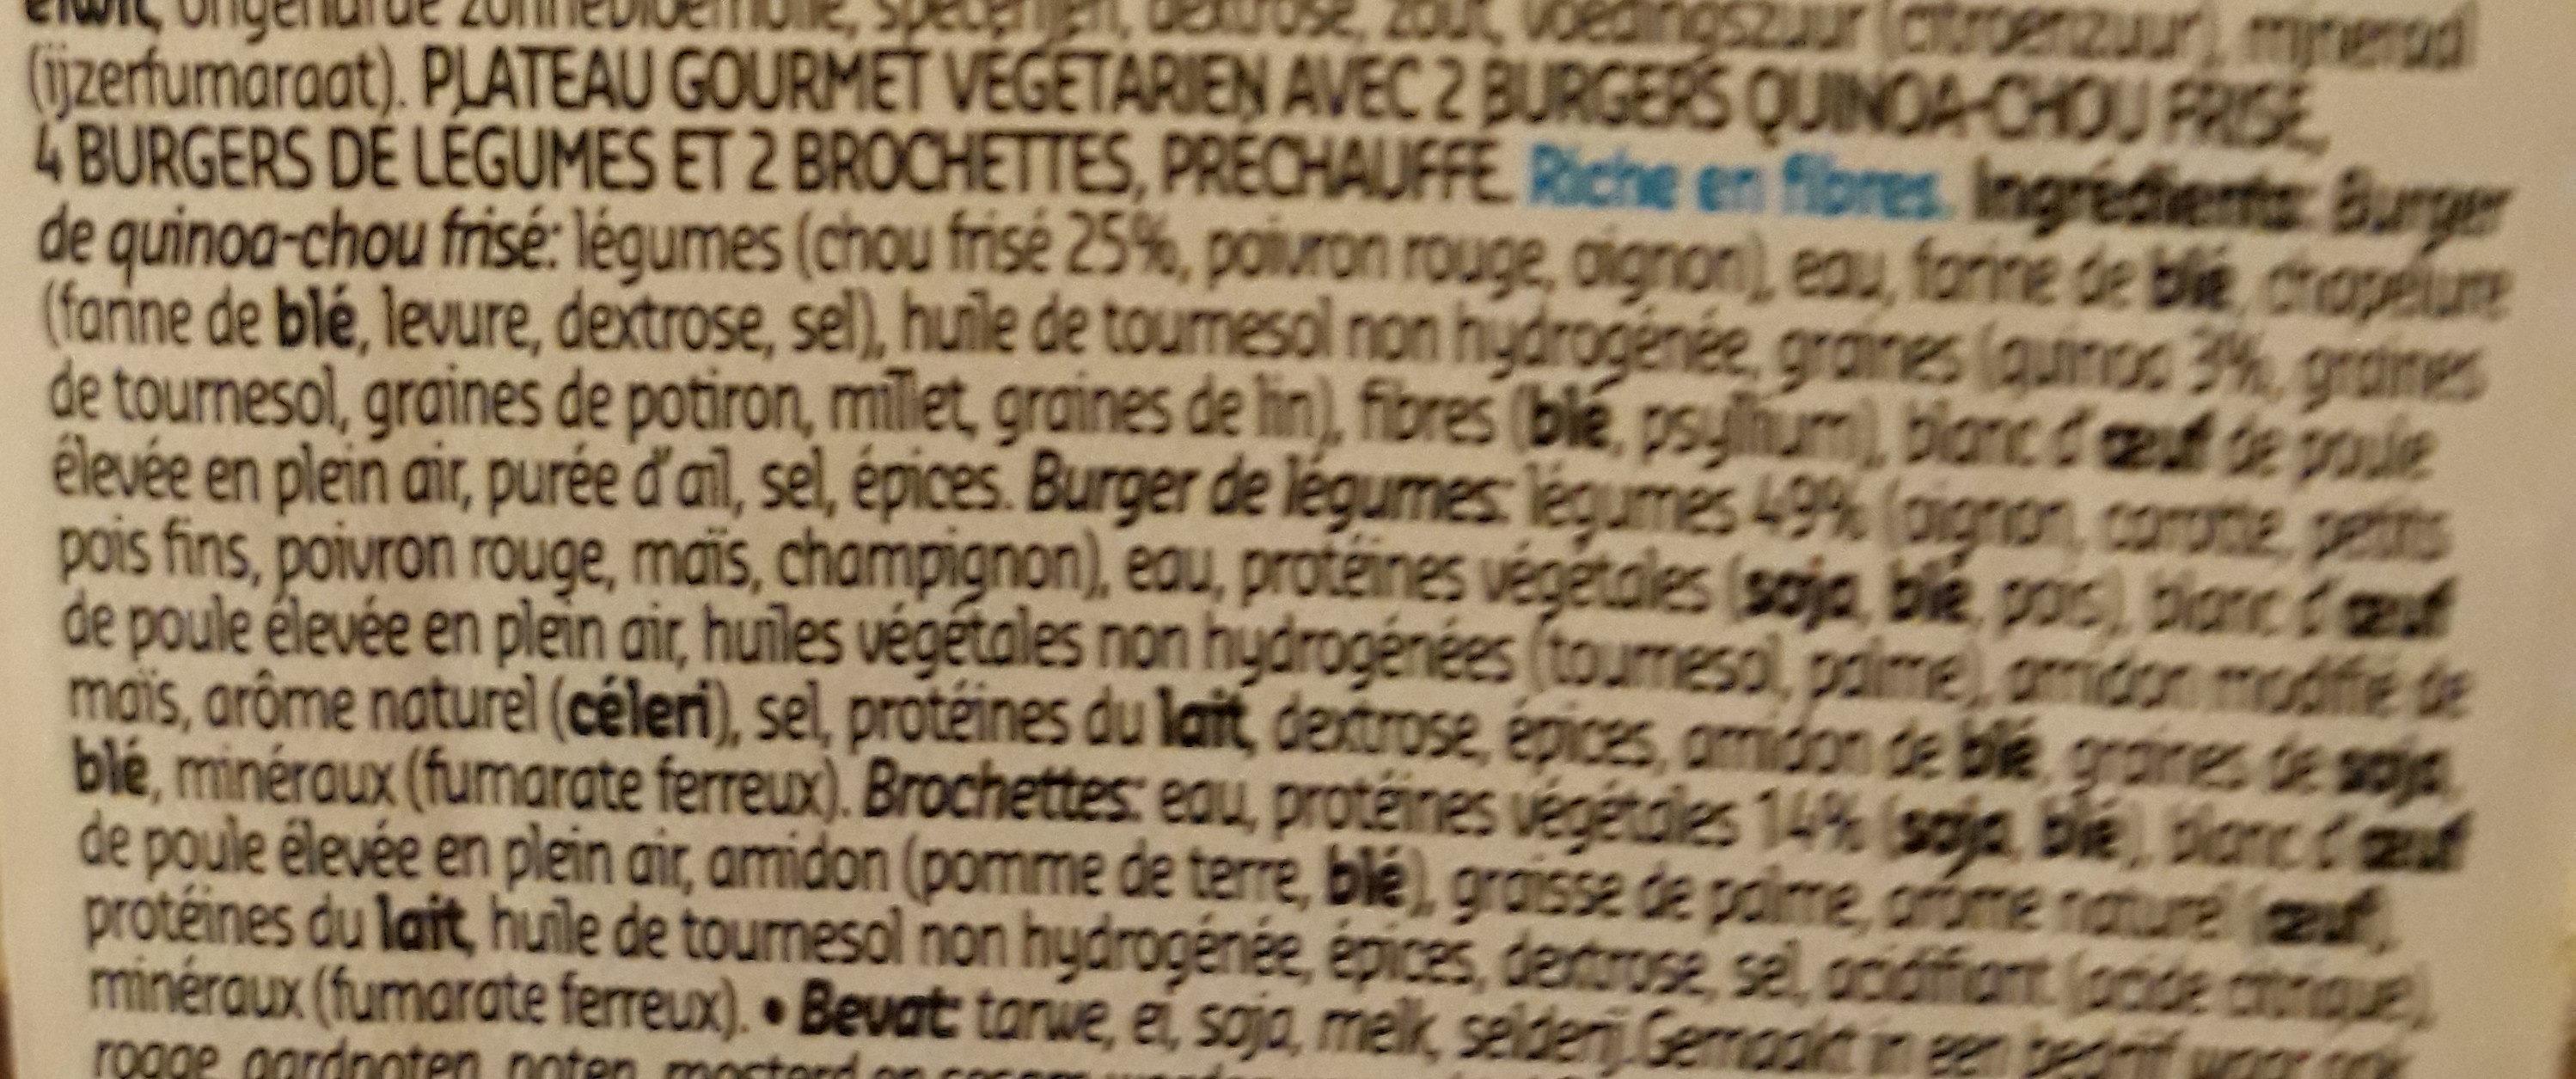 plateau gourmet veggie - Ingrediënten - fr